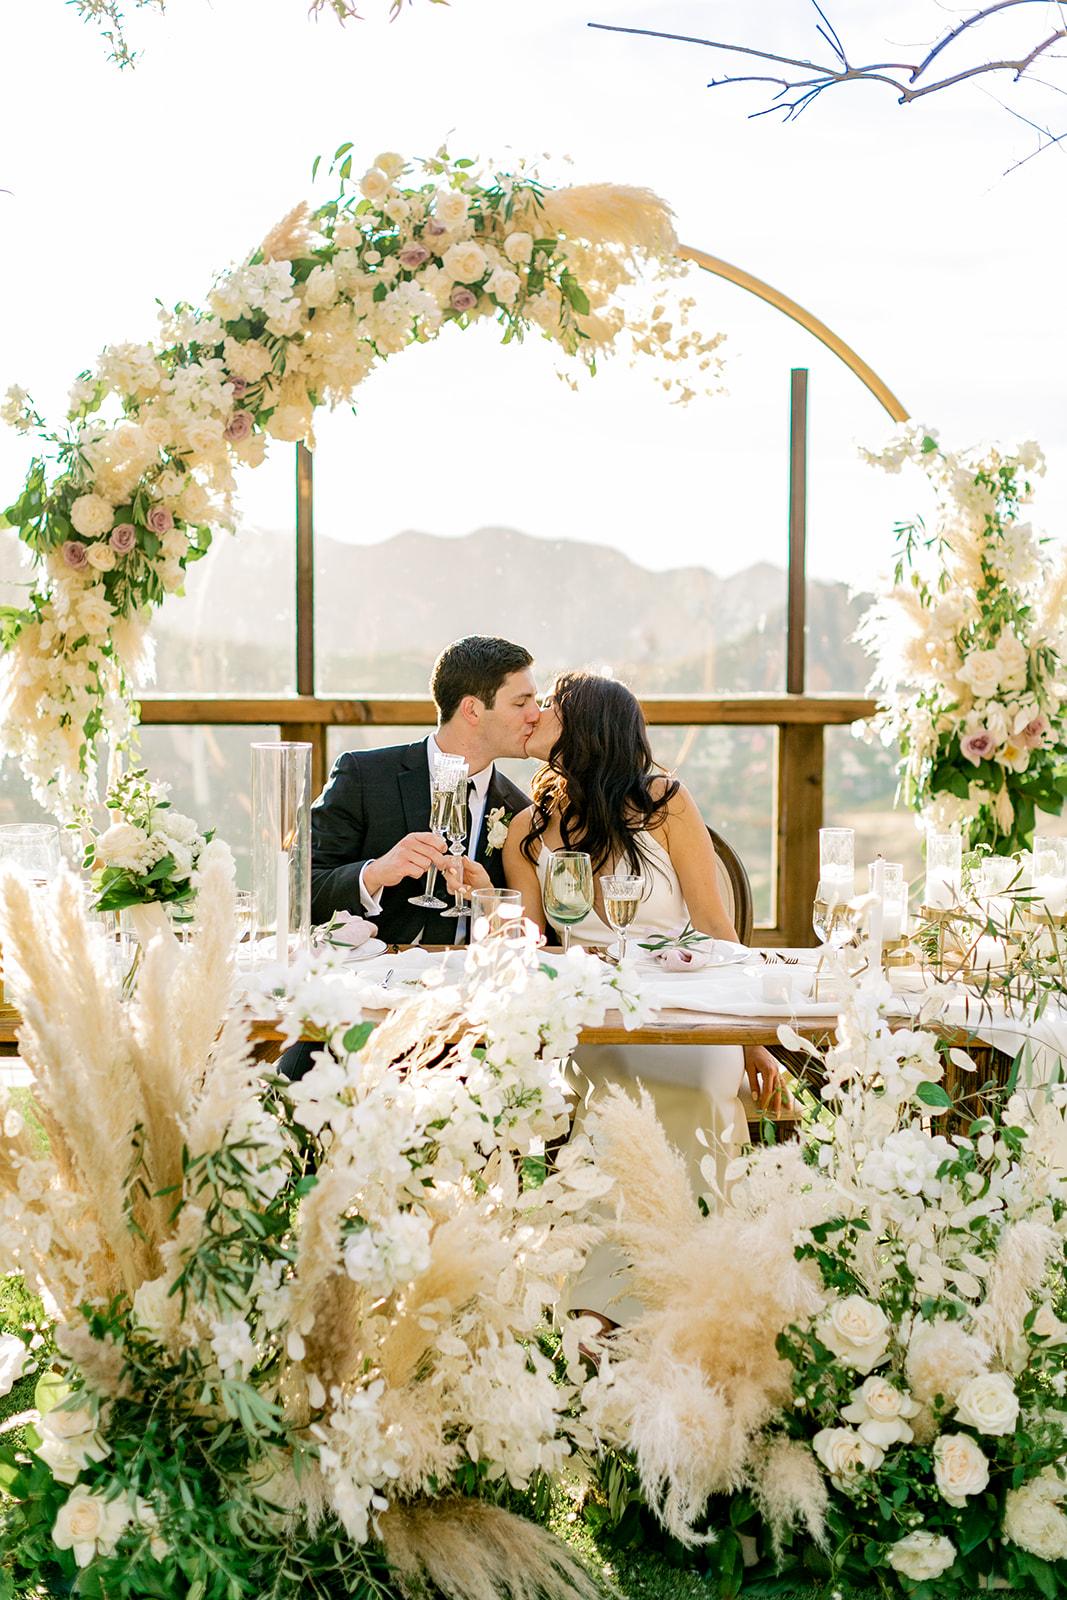 Ben & Emma's Wedding - Natalie Schutt Photography - Reception-108.jpg